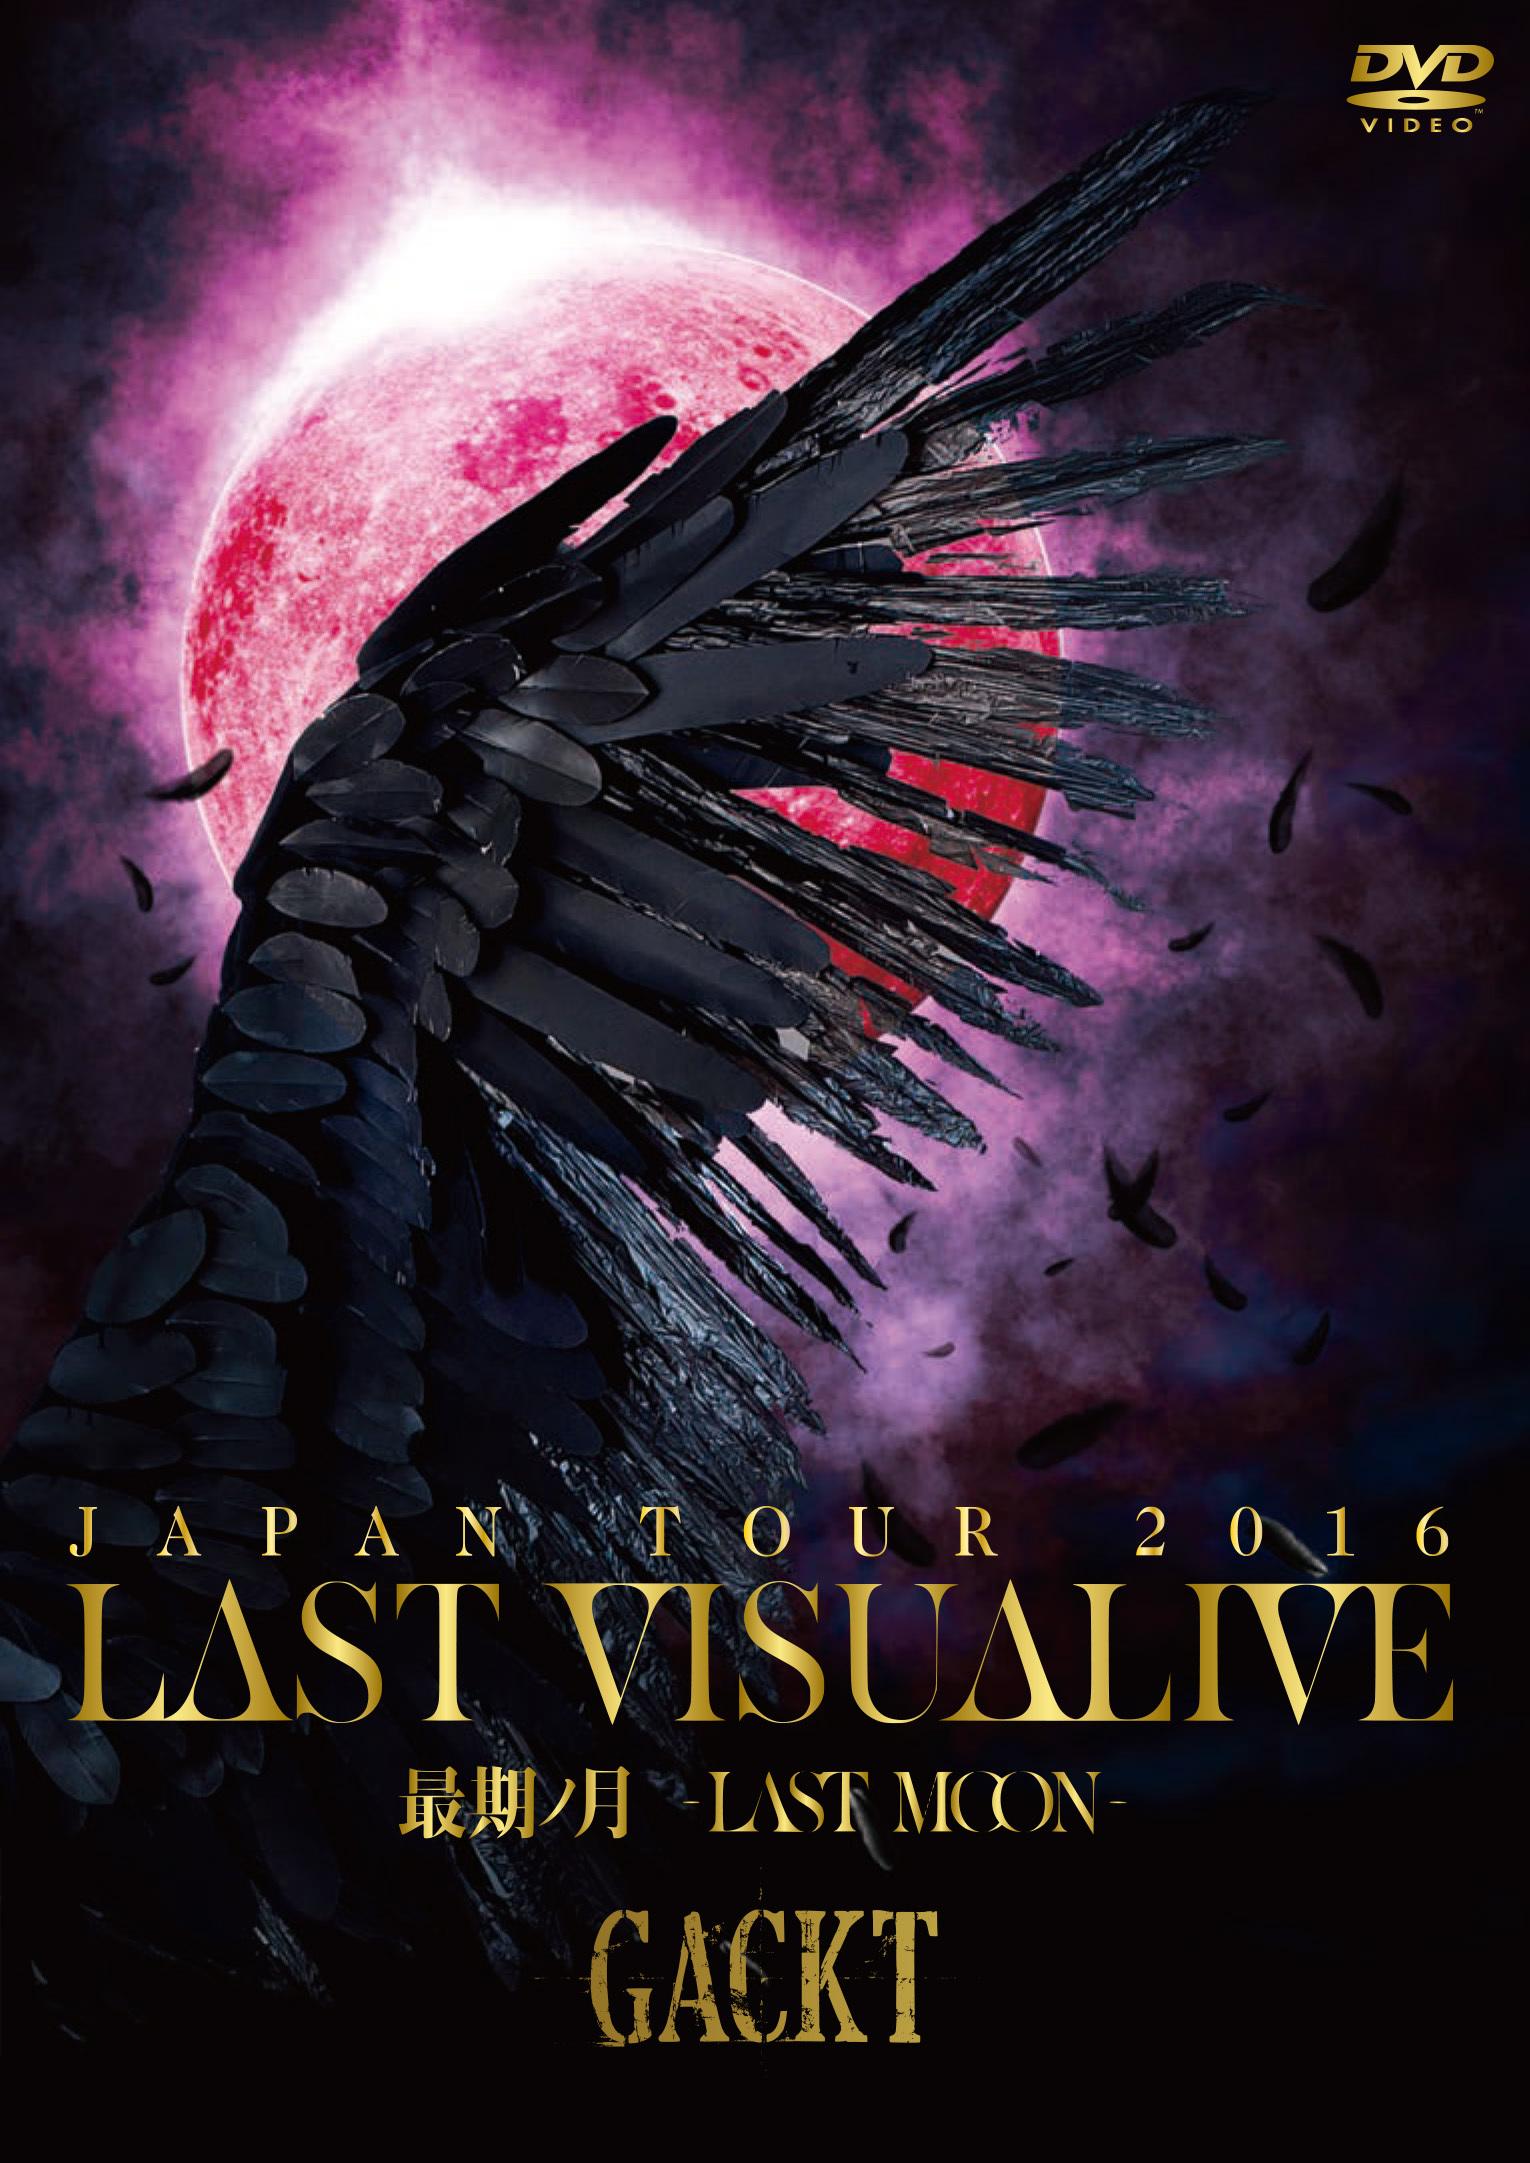 Gackt_japan_tuor_2016_last_visualive_%e6%9c%80%e6%9c%9f%e3%83%8e%e6%9c%88_-last_moon-__%e9%80%9a%e5%b8%b8%e7%9b%a4___dvd_